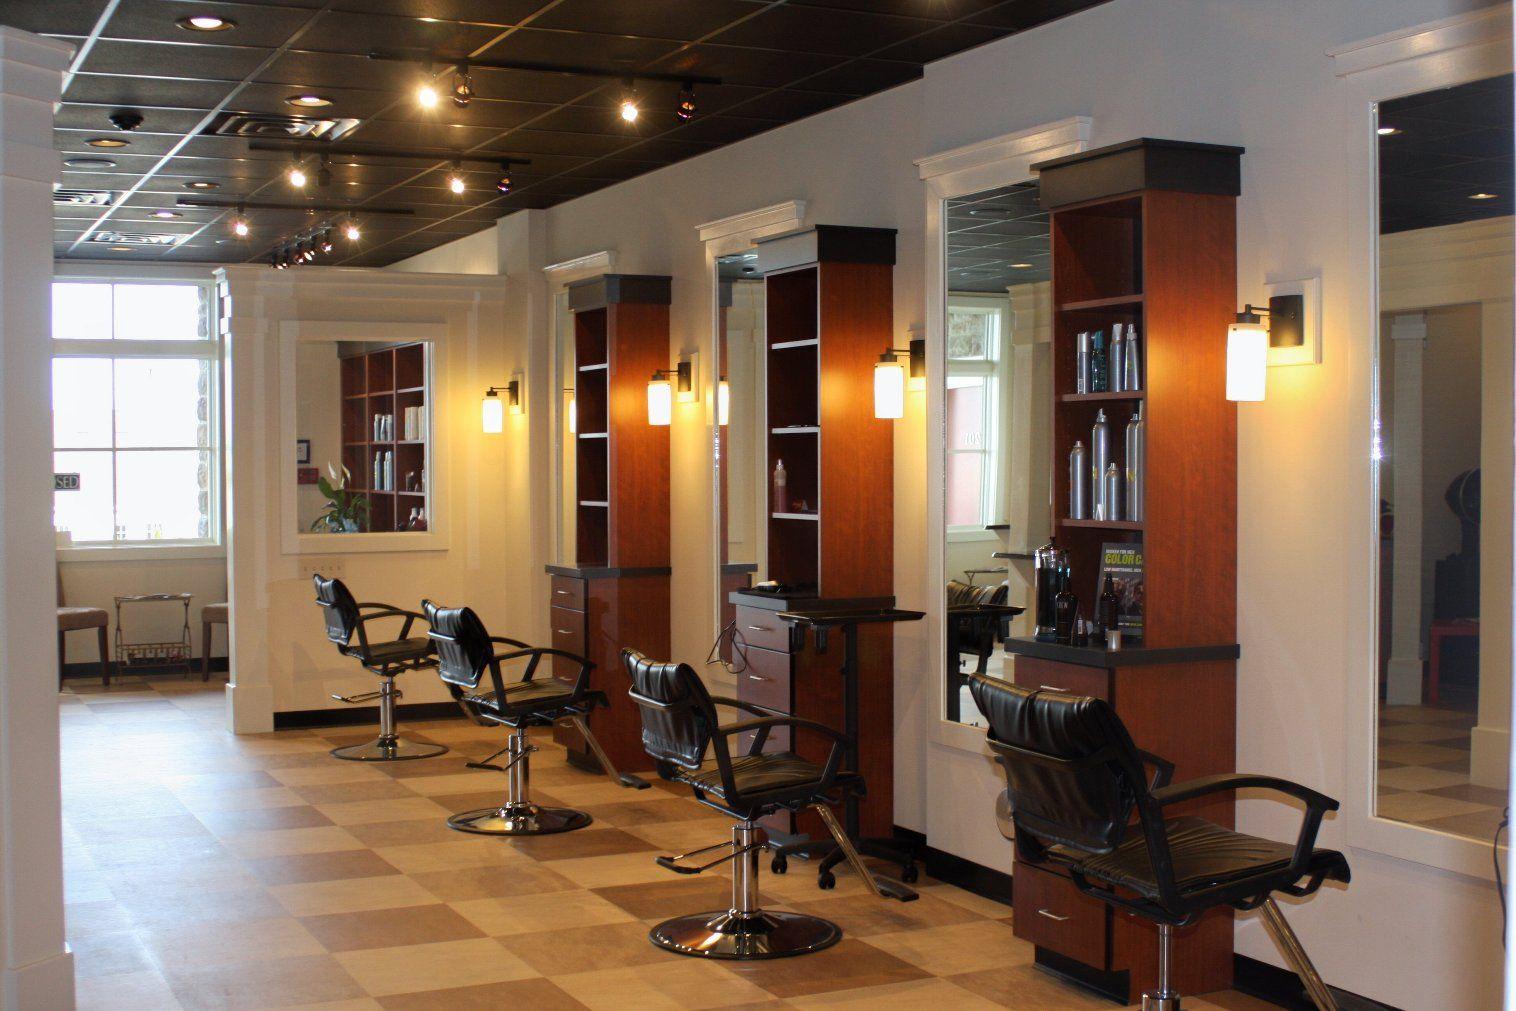 Beauty Salon Interior Decorating and Design Ideas